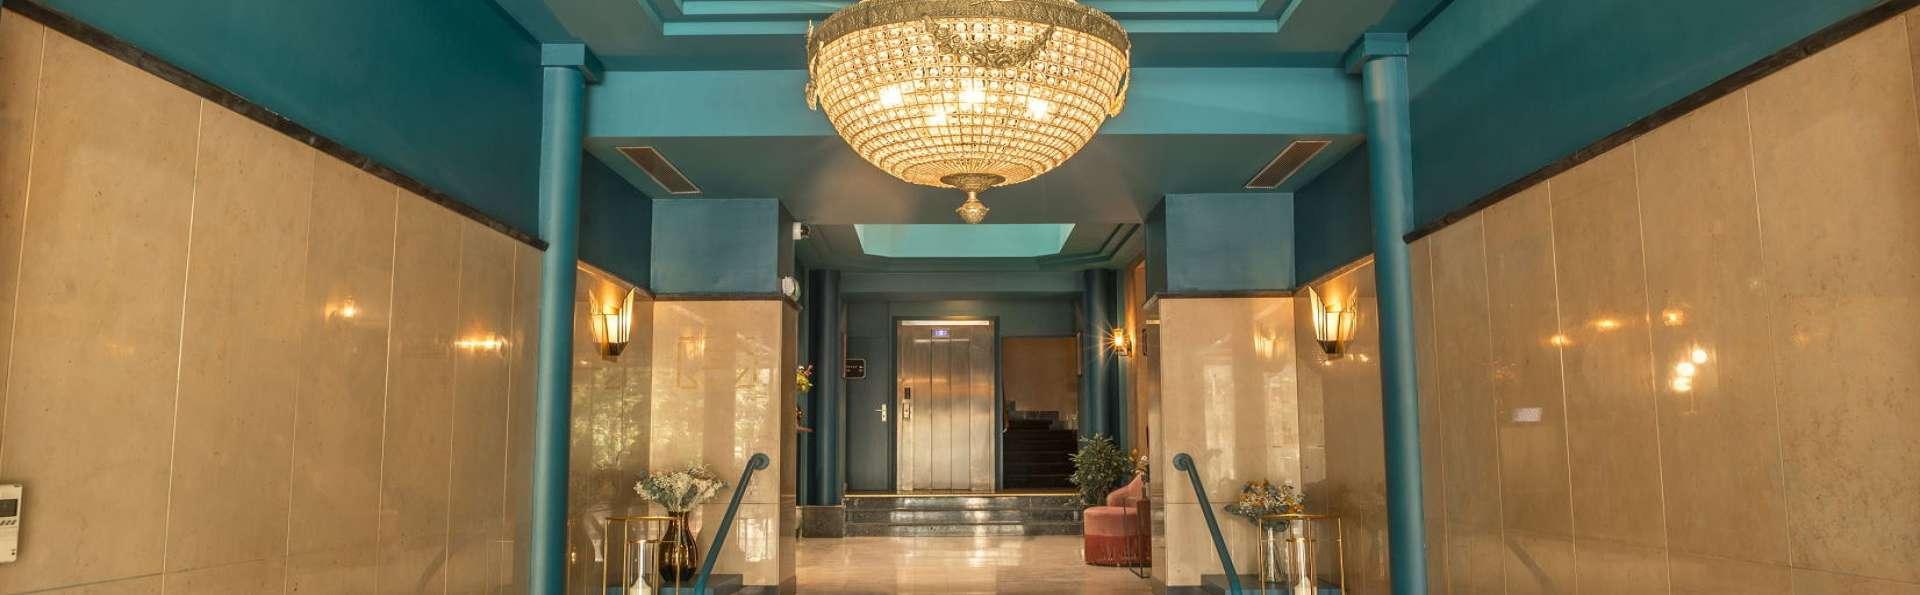 Hôtel Bristol - hall_retouchee.jpg